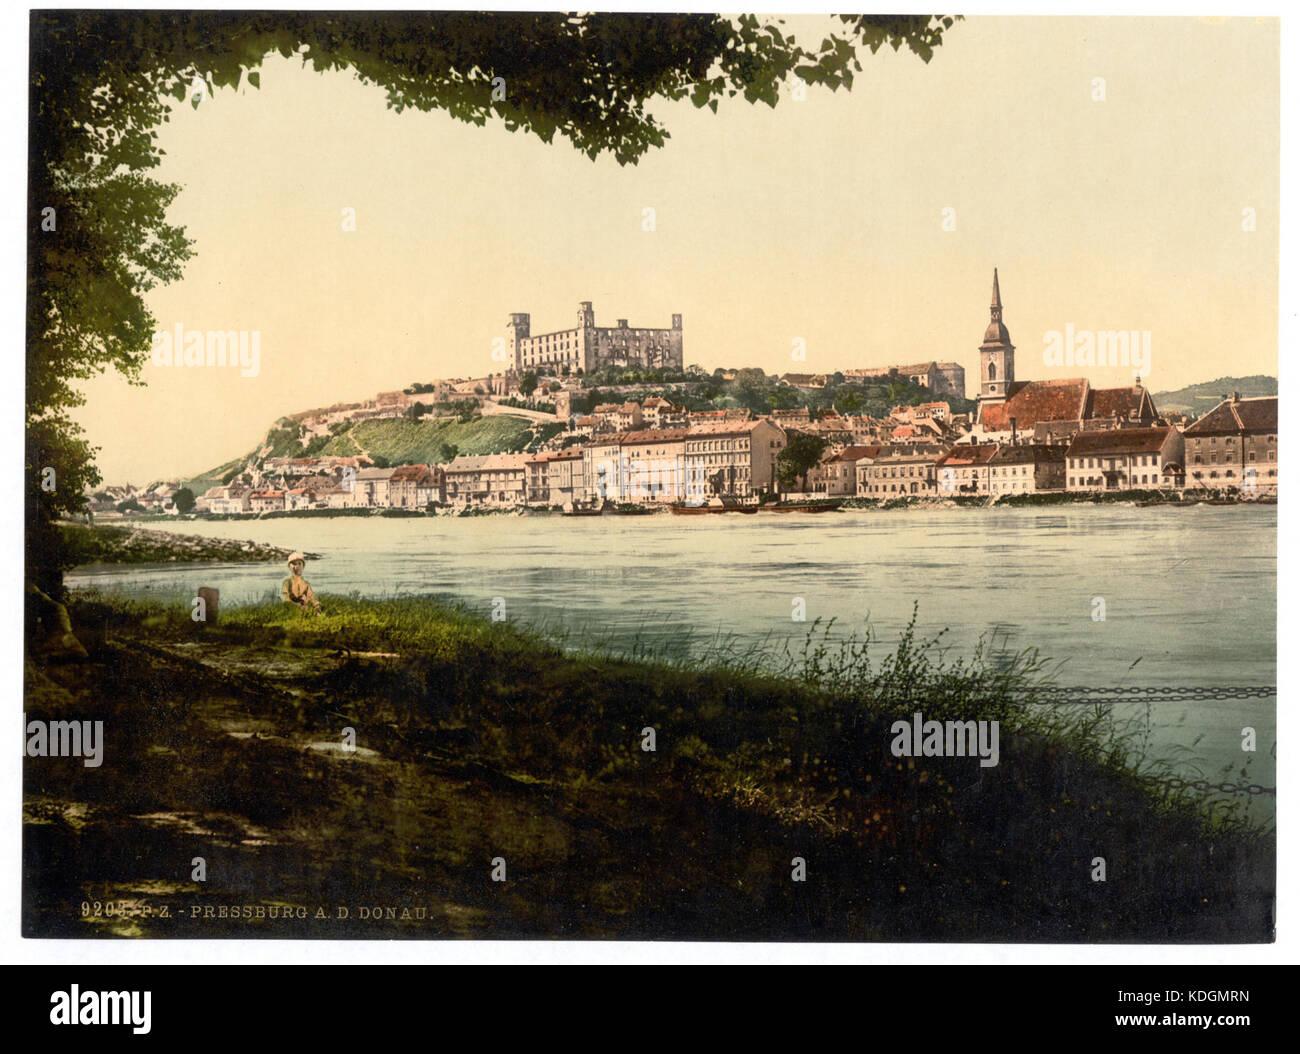 Pressburg, Austro Hungary LCCN2002710888 - Stock Image